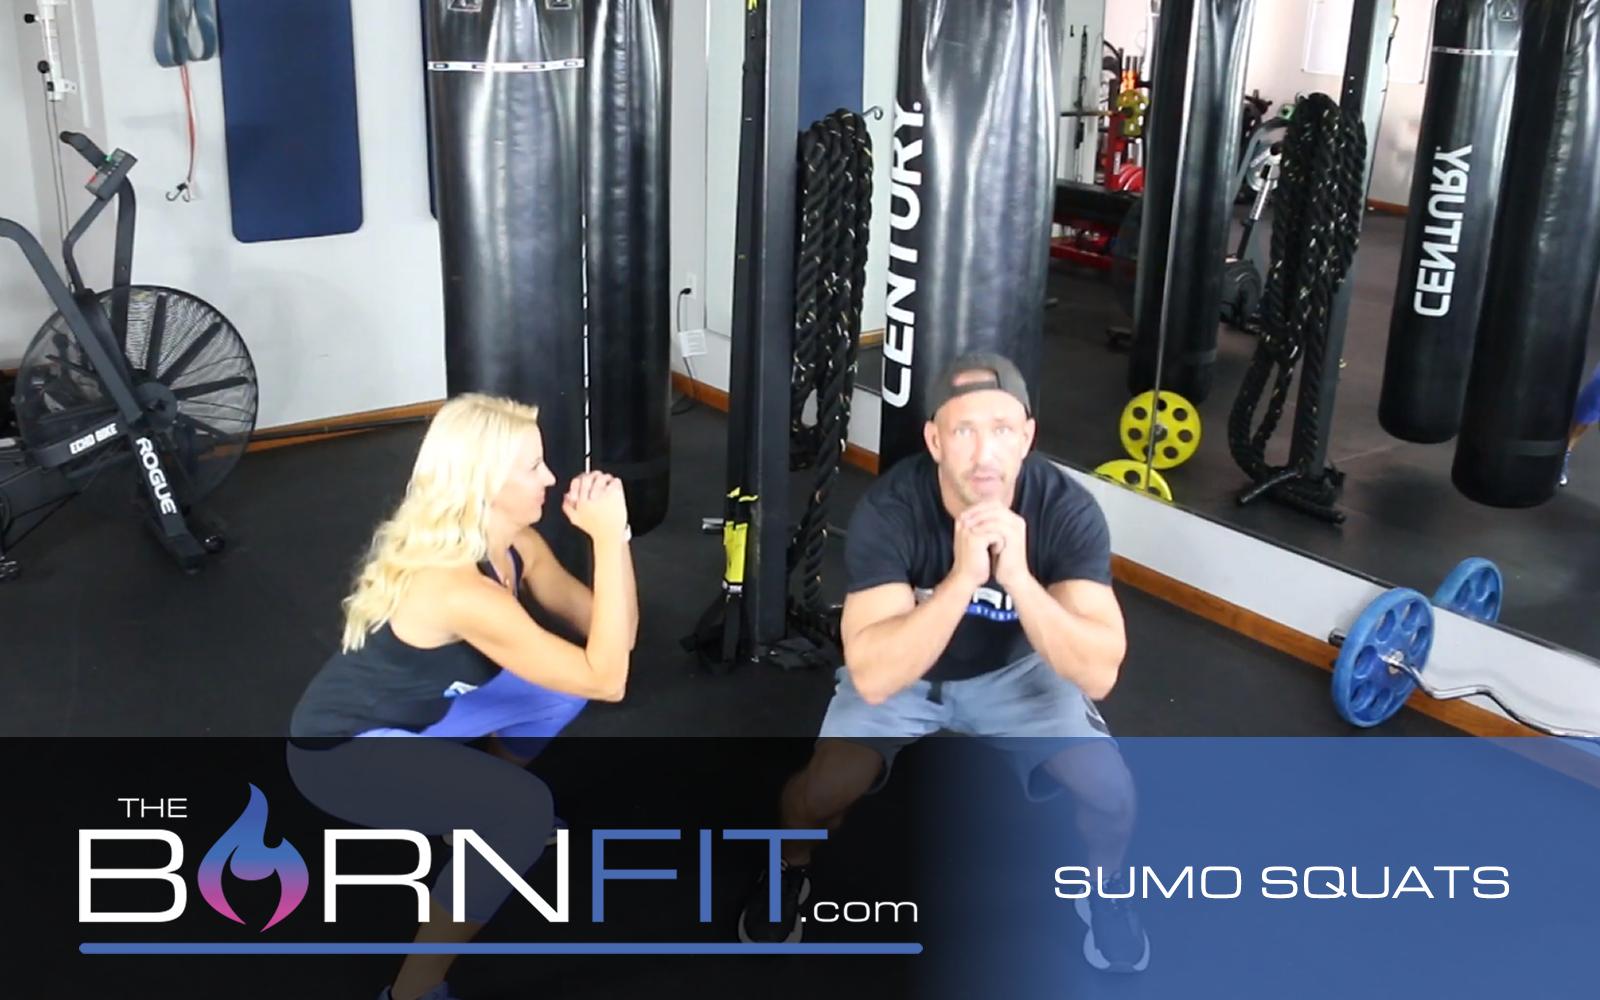 sumo squats workout